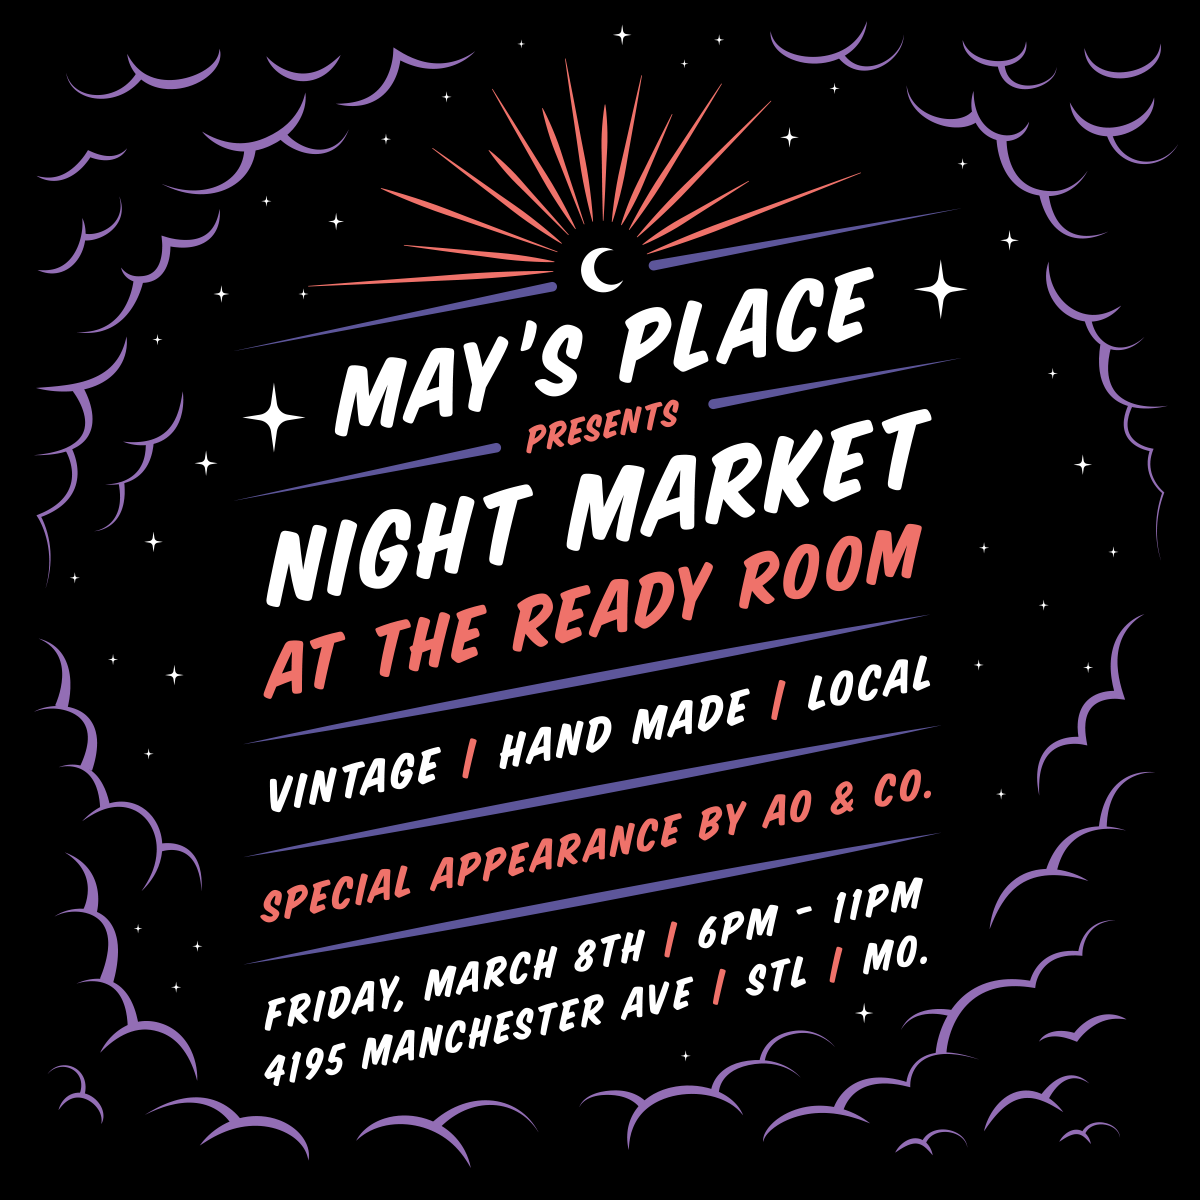 Night-Market-7---Spring-2019_Night-Market---Square-Format.png